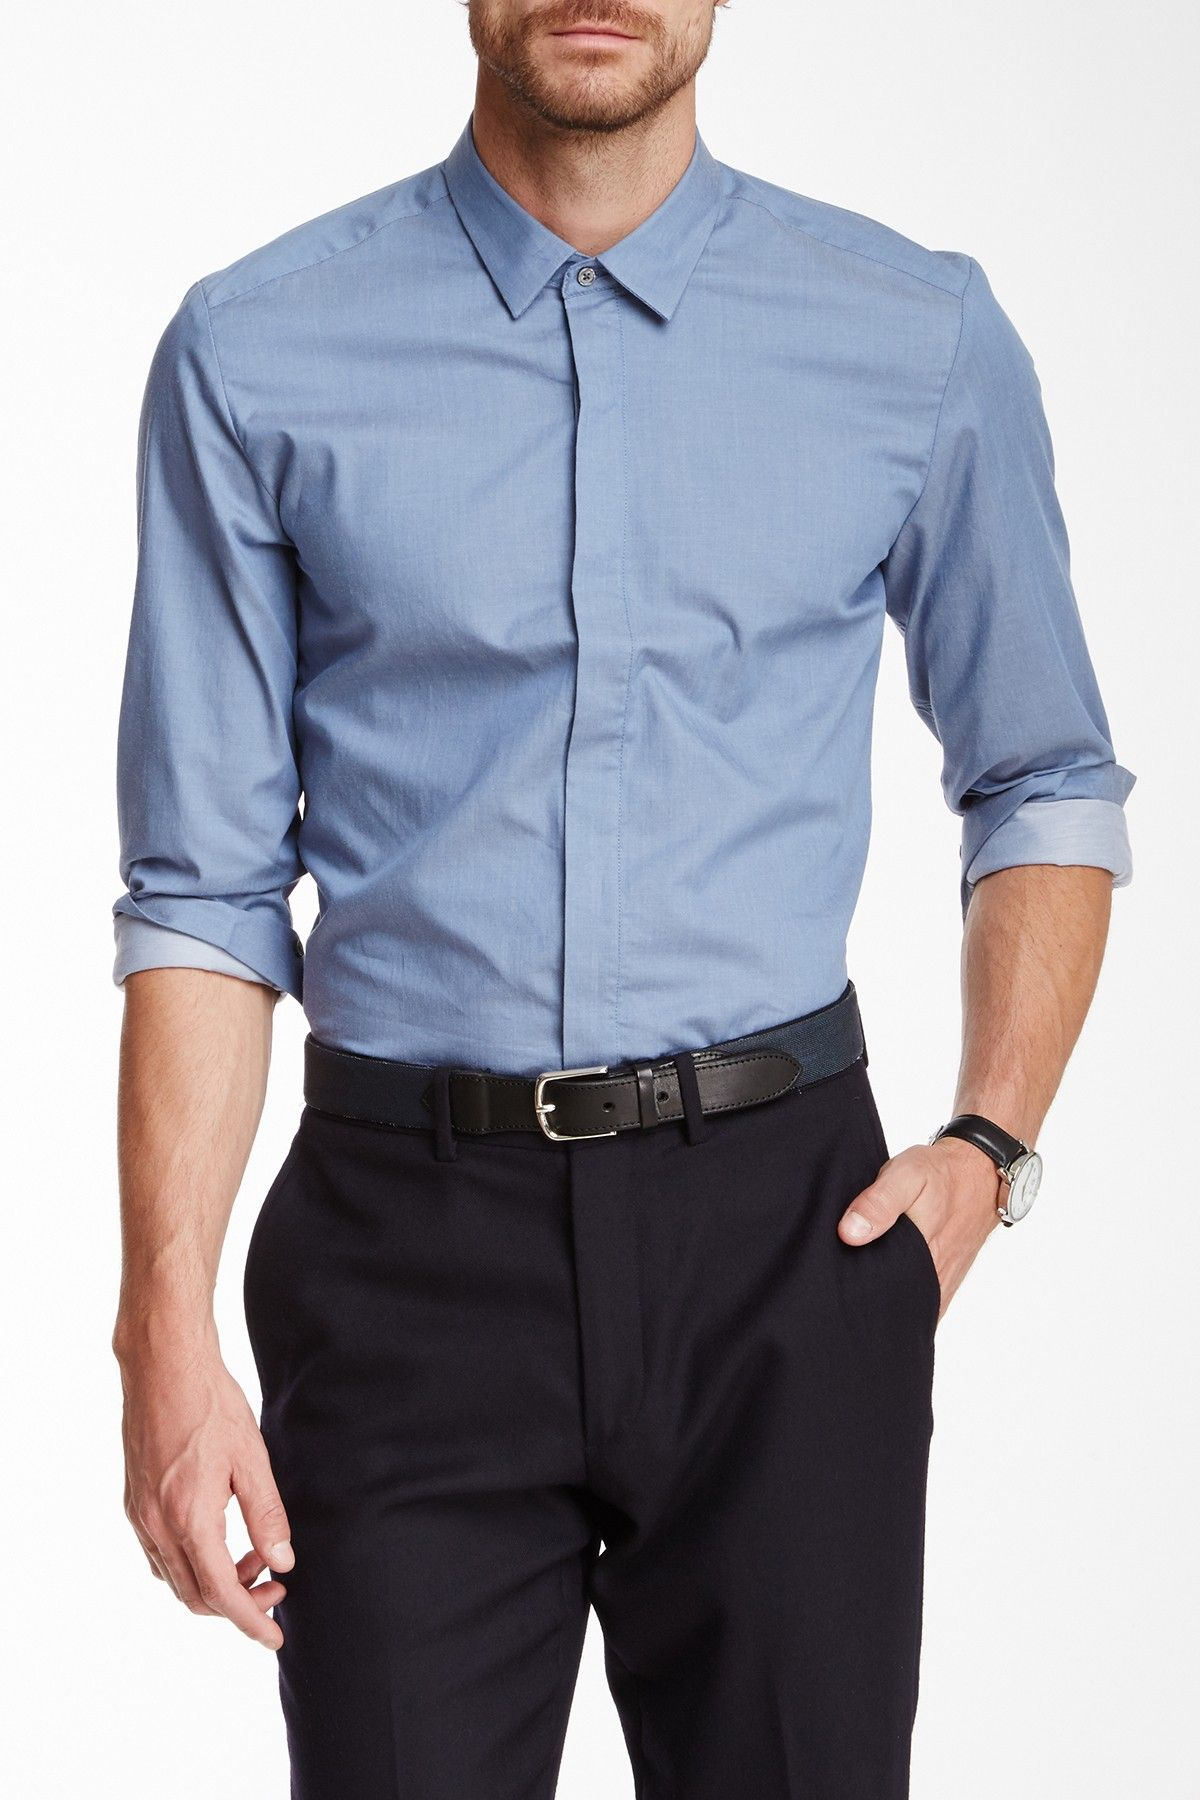 men\'s style | Men\'s Style | Pinterest | Guy clothes, Male fashion ...